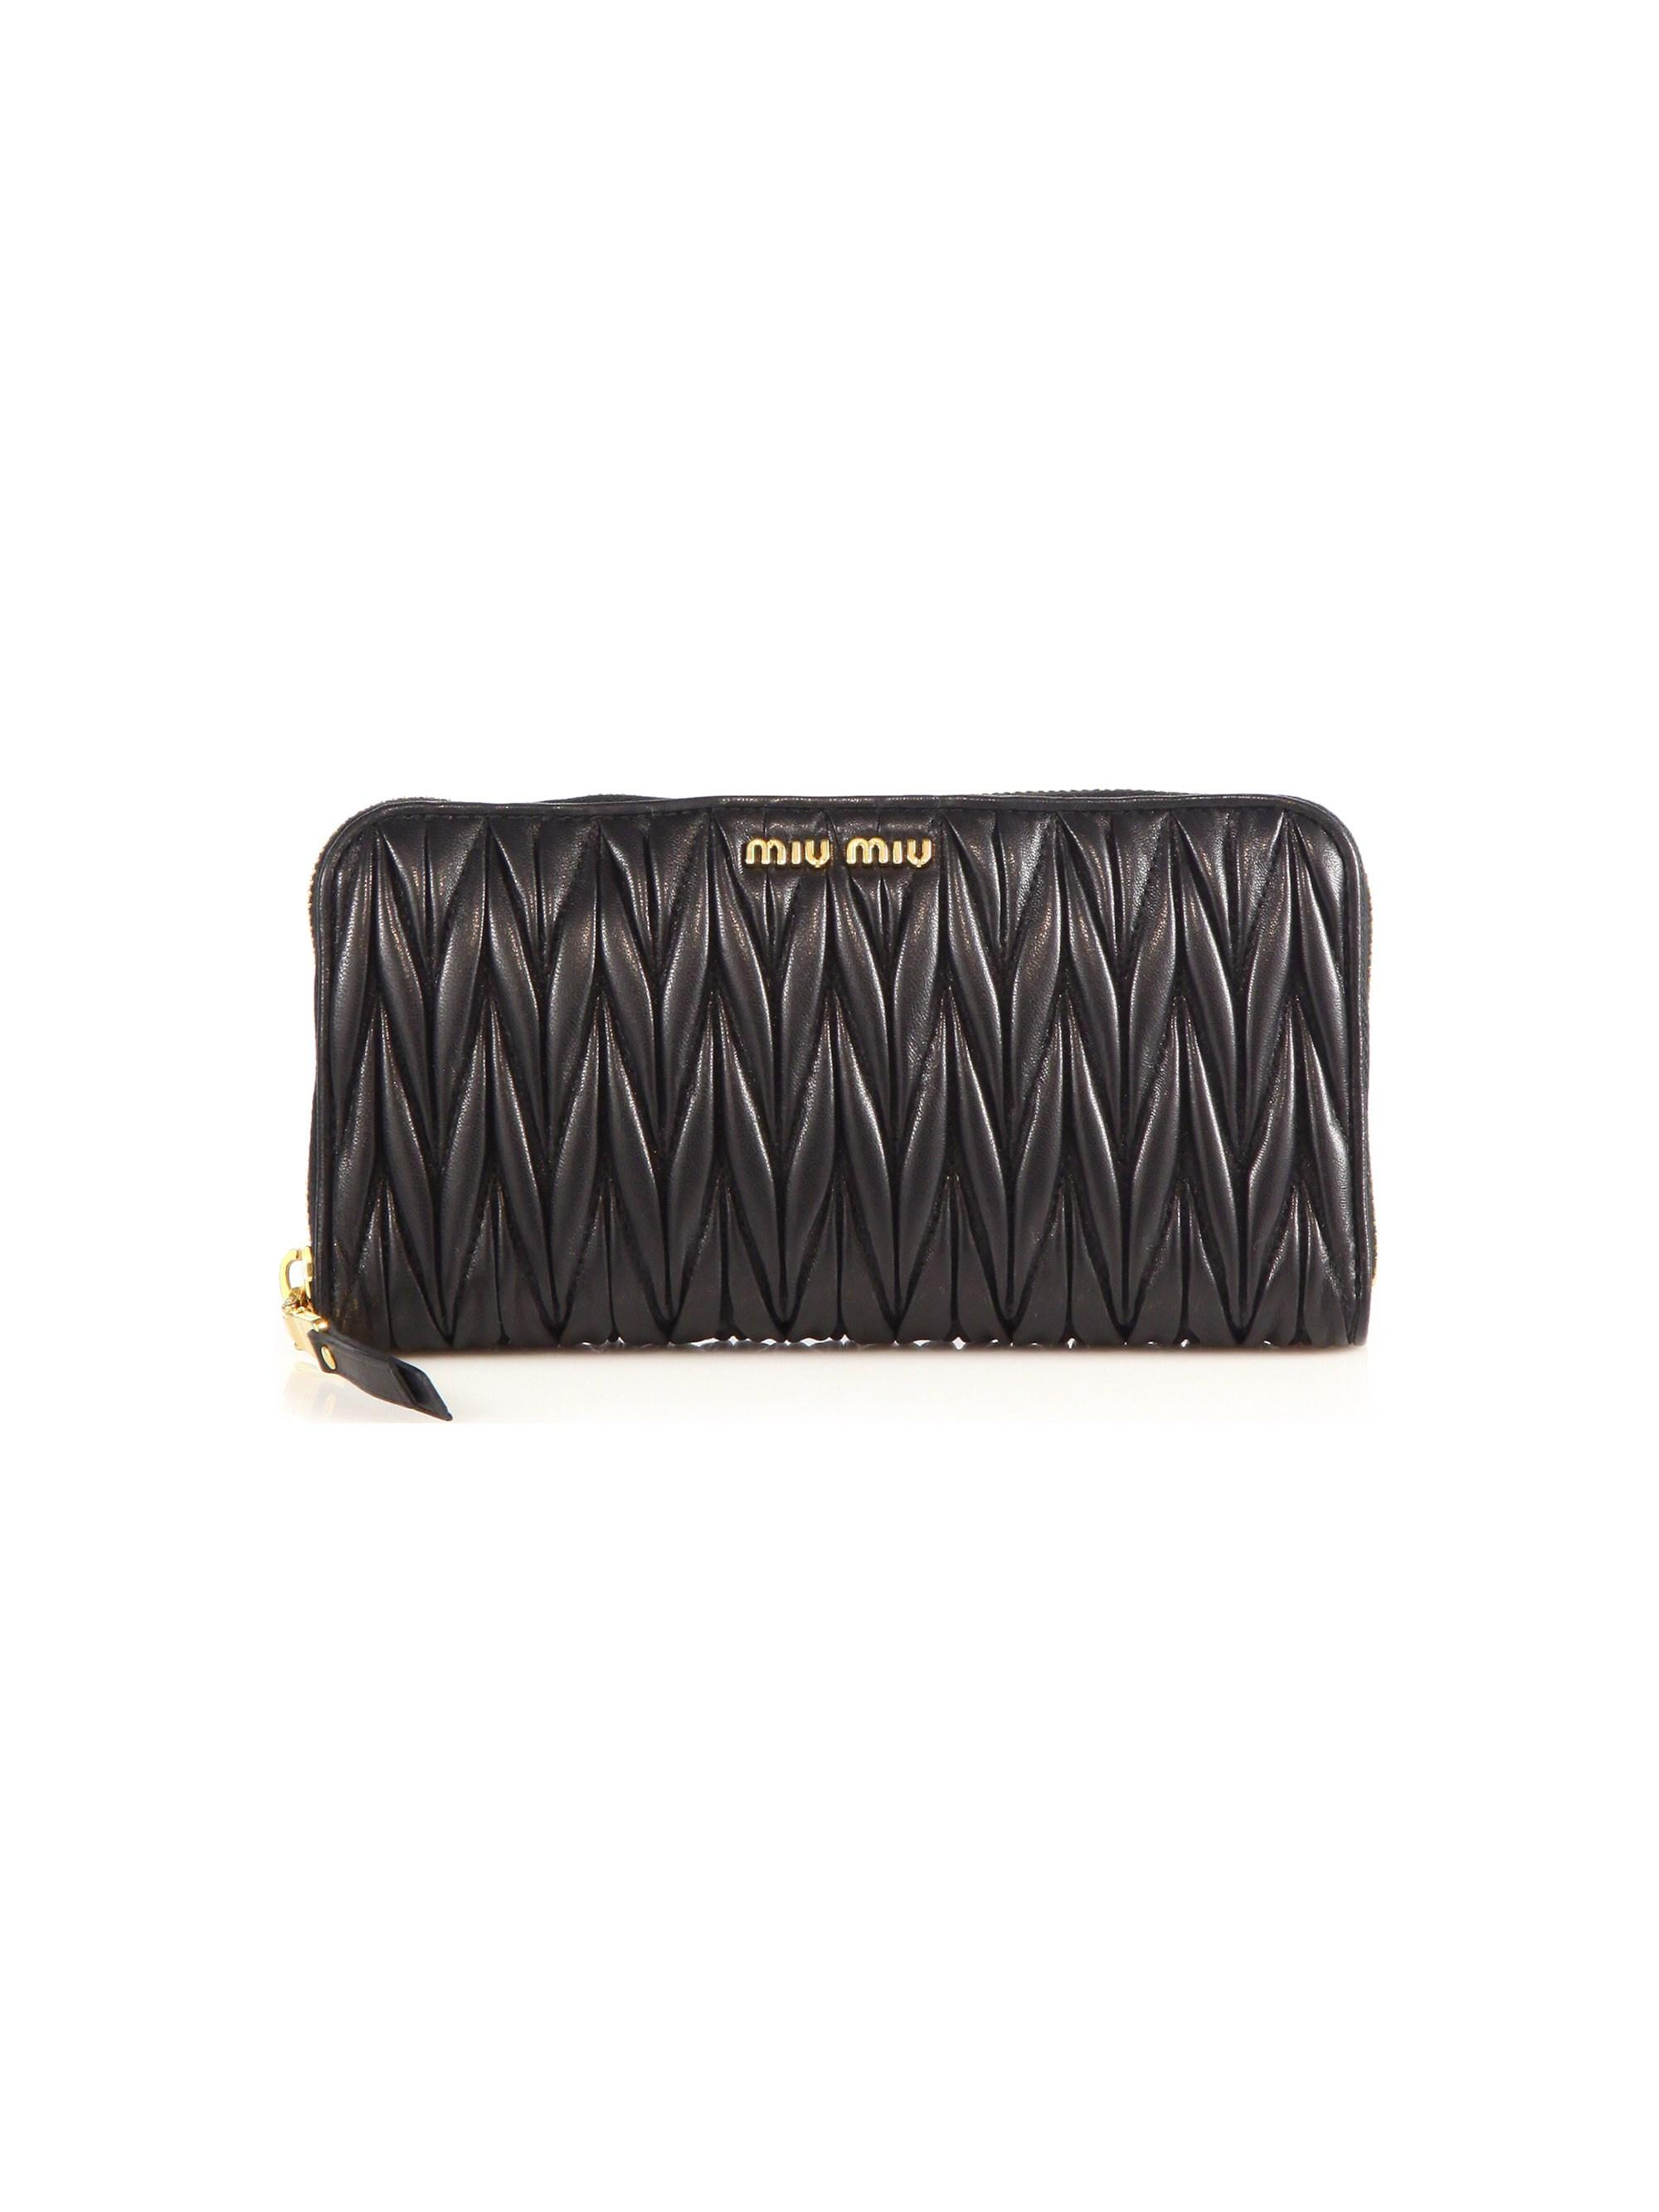 6c25c58b6810 Lyst - Miu Miu Women s Matelasse Leather Zip Continental Wallet ...